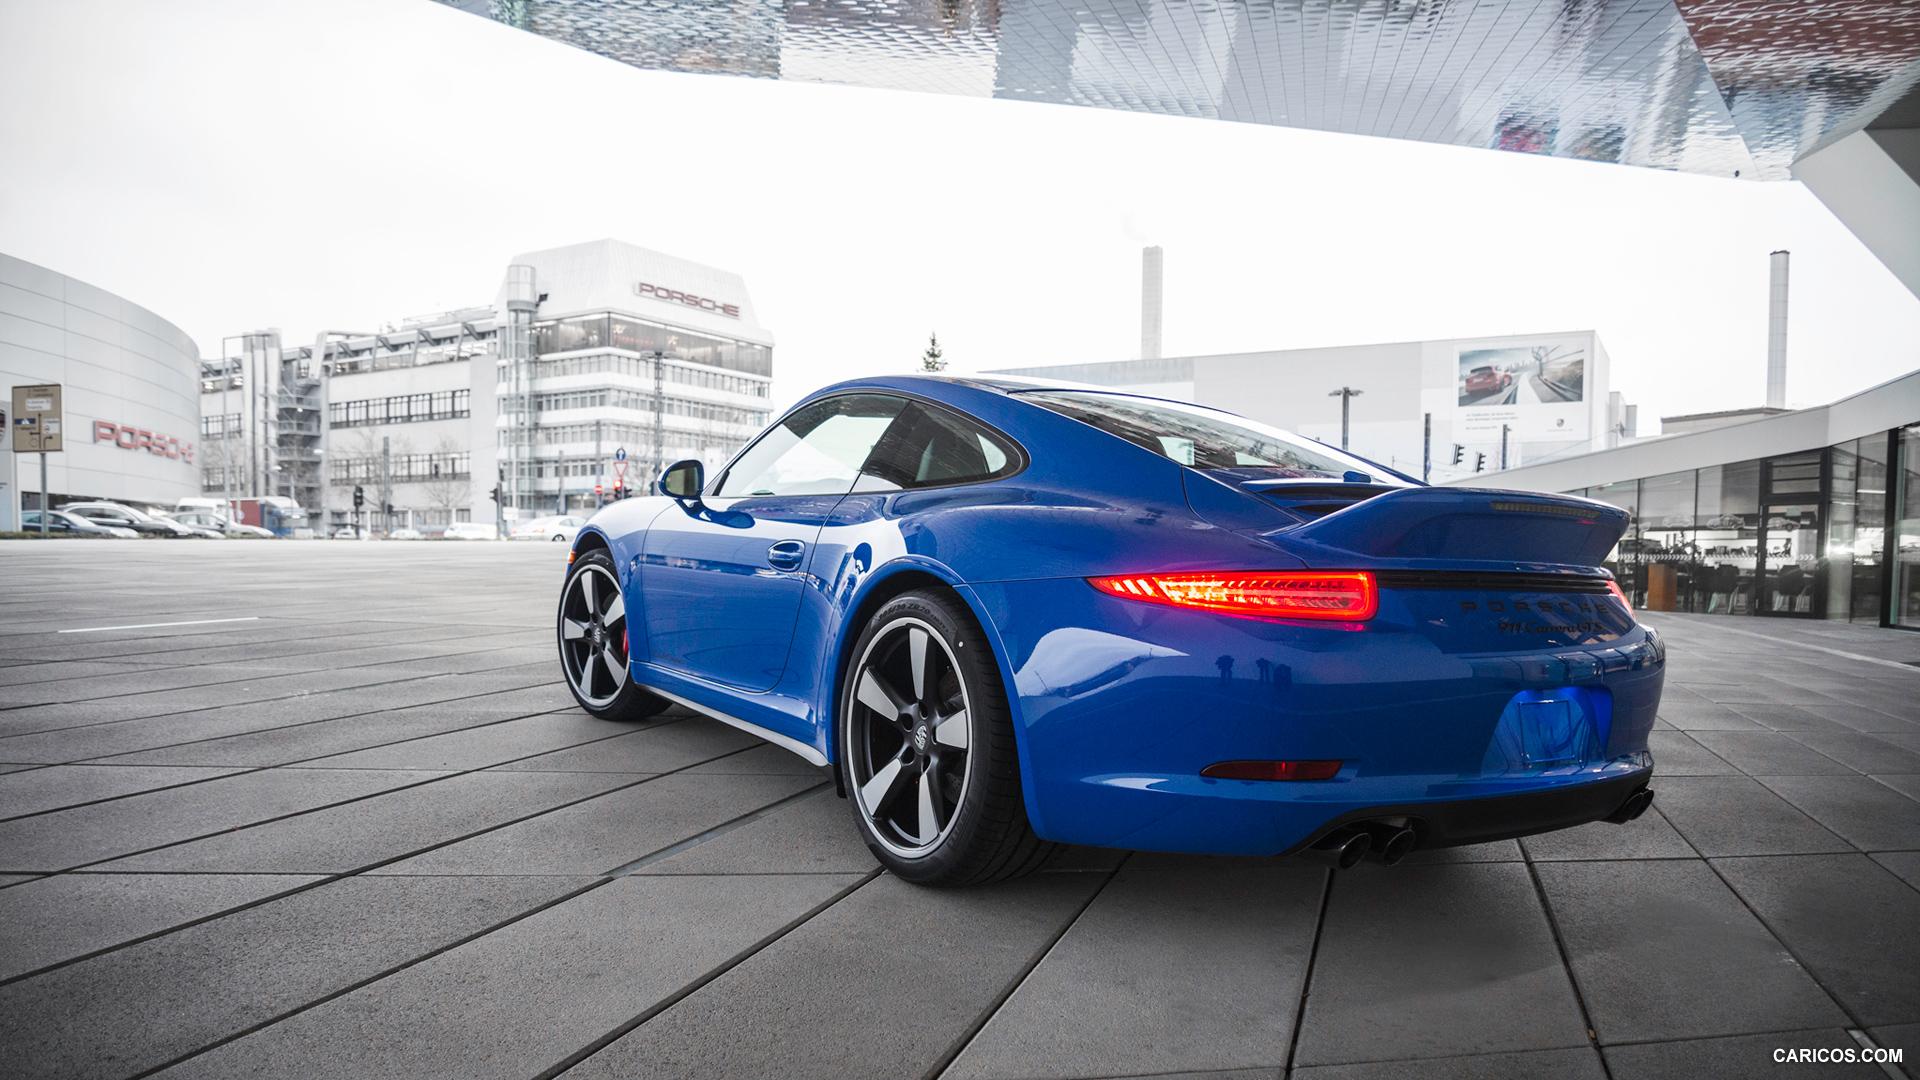 New Porsche 911 Carrera GTS Pictures